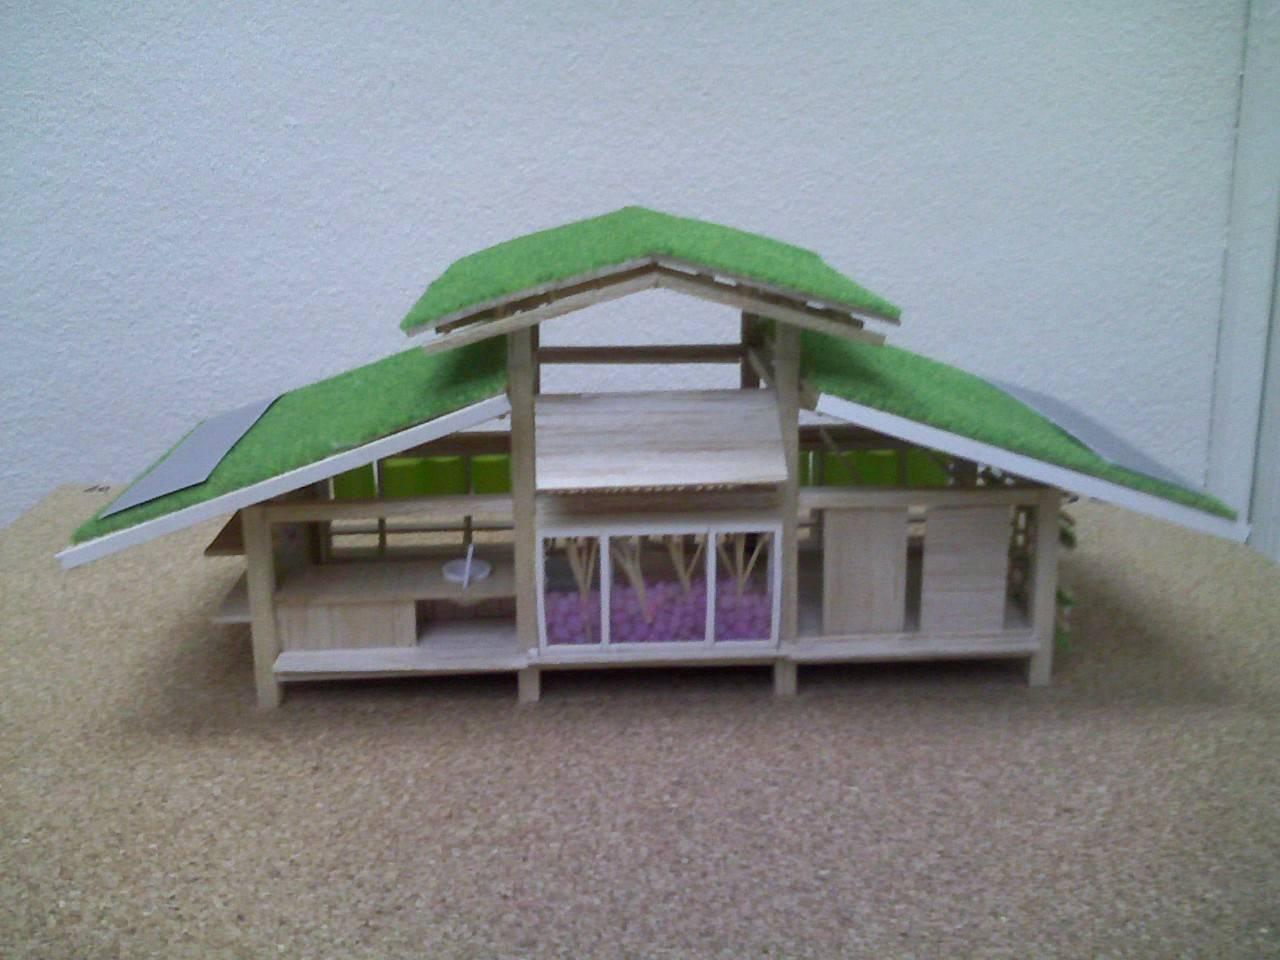 Green Roof Design Ideas Miniature House Home Plans Blueprints 43450